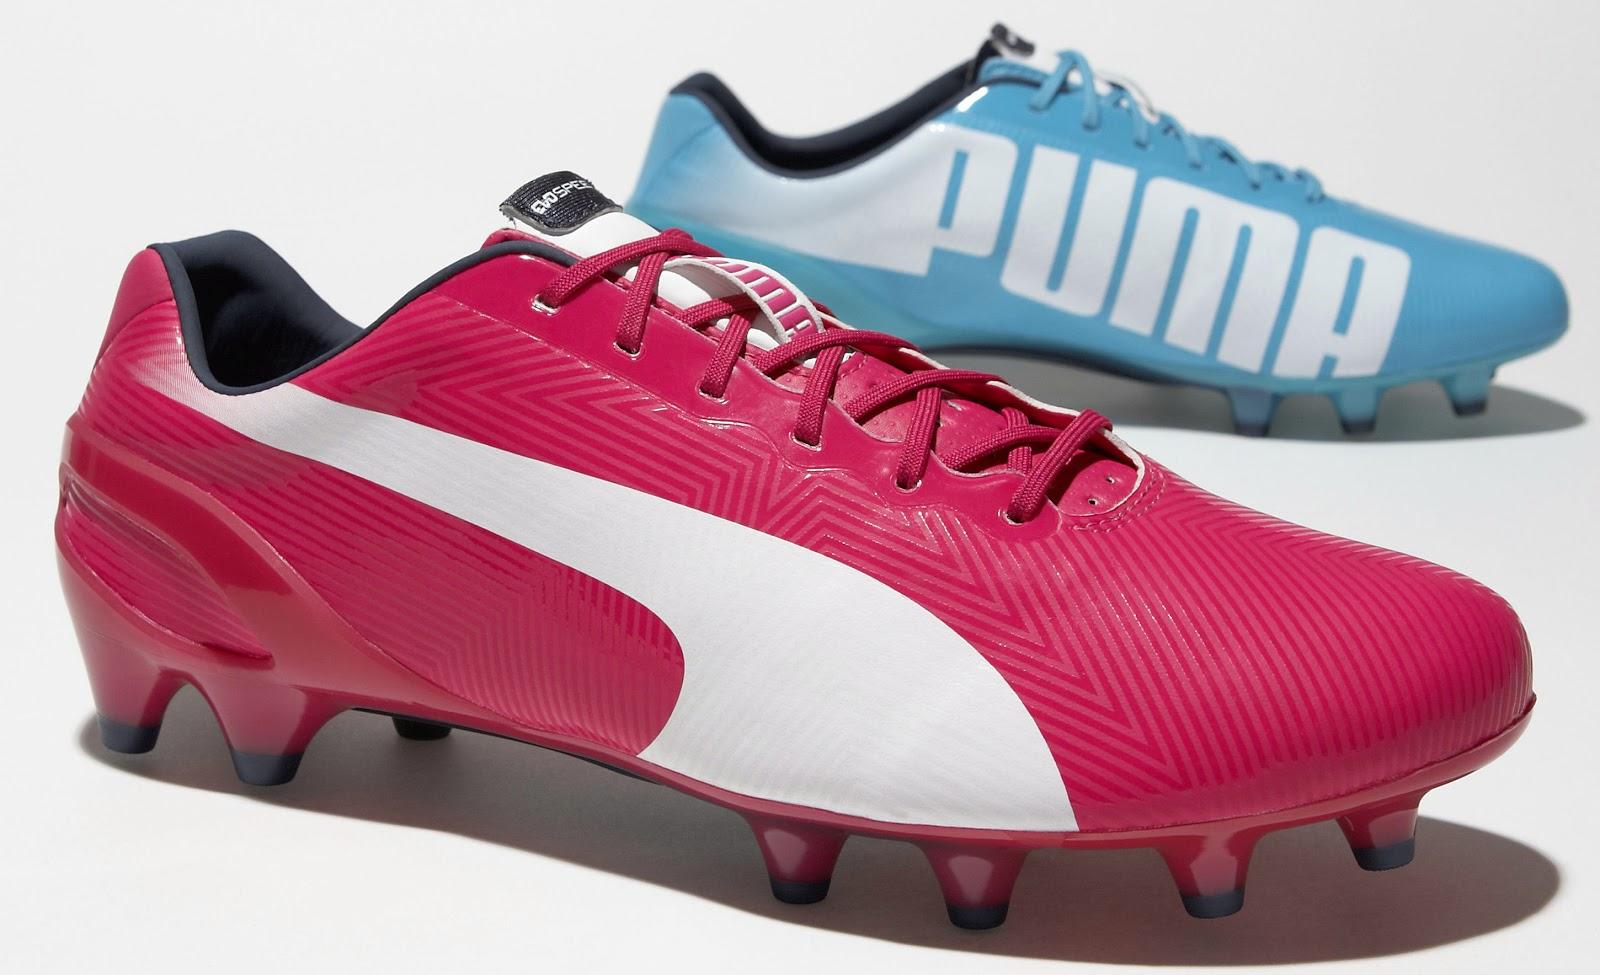 Puma Boots 2019 World Cup